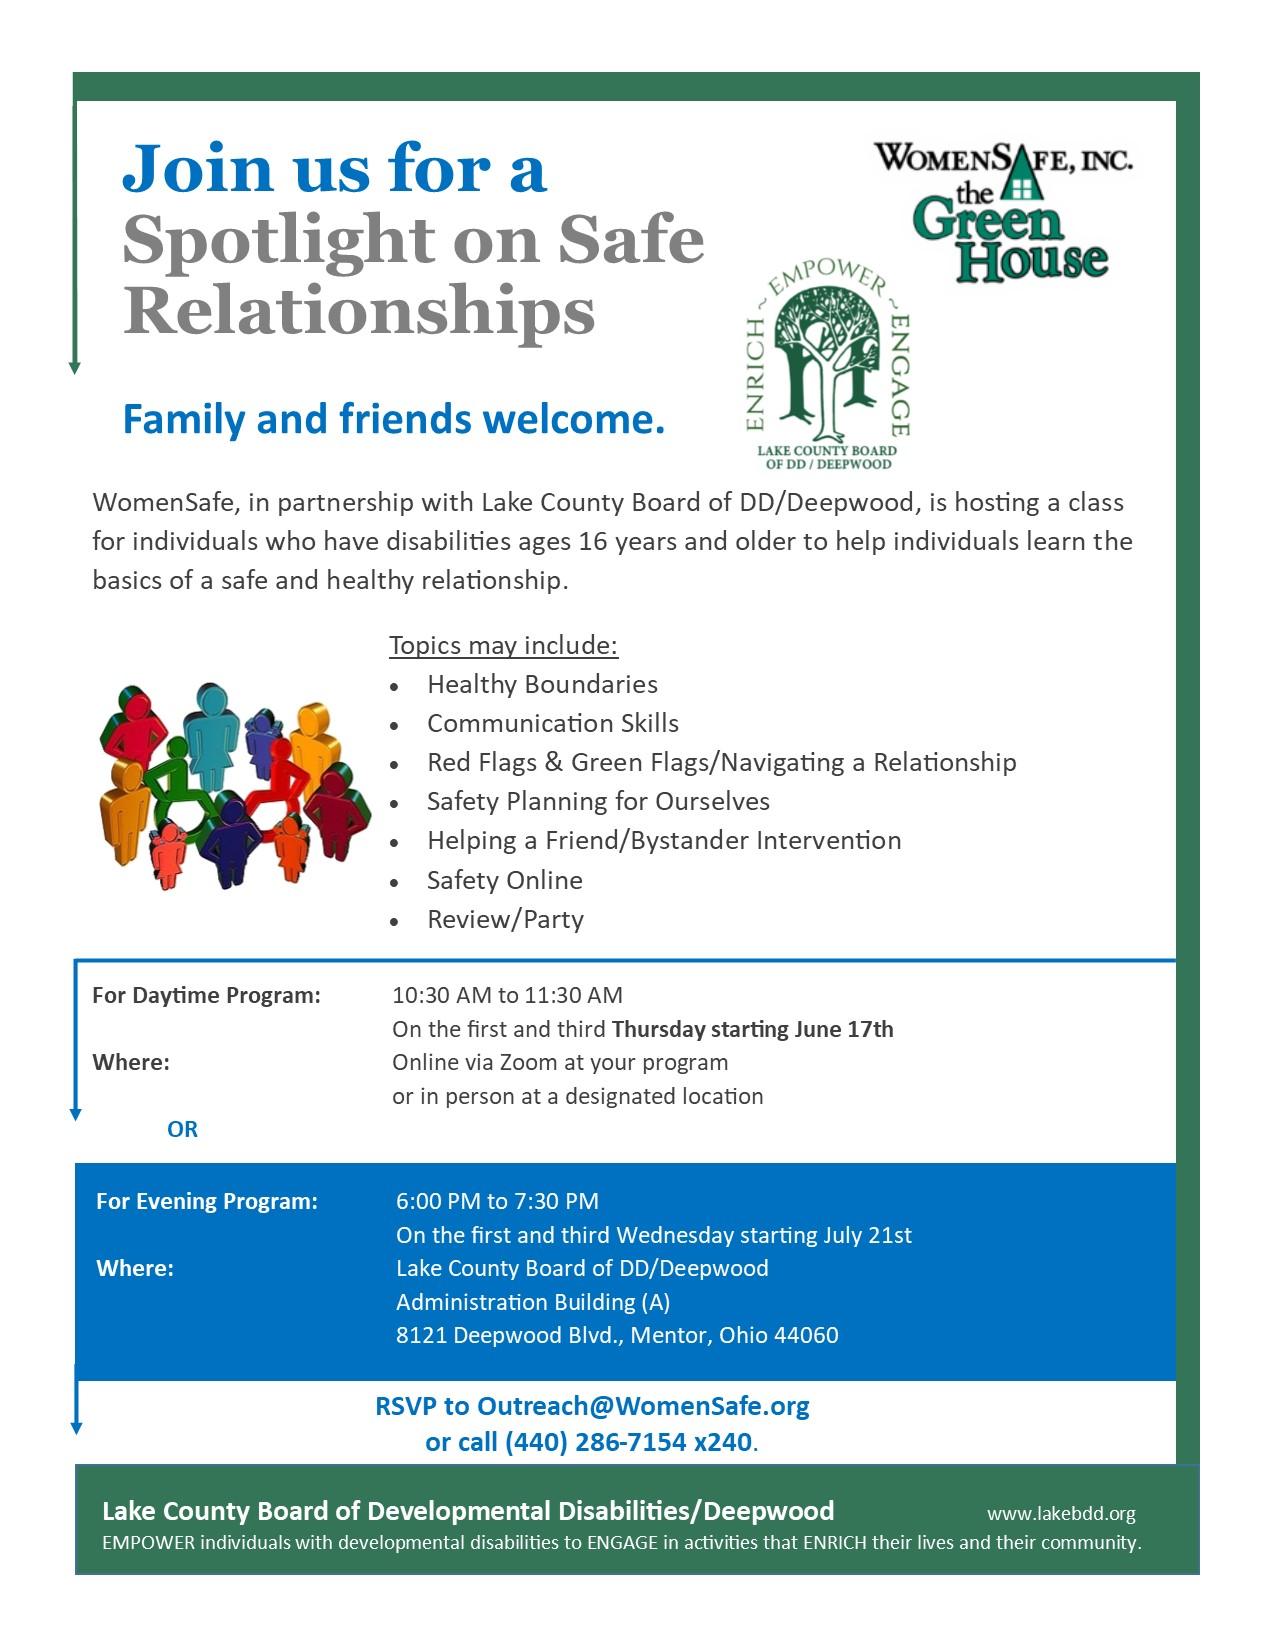 WomenSafe: Spotlight On Safe Relationships